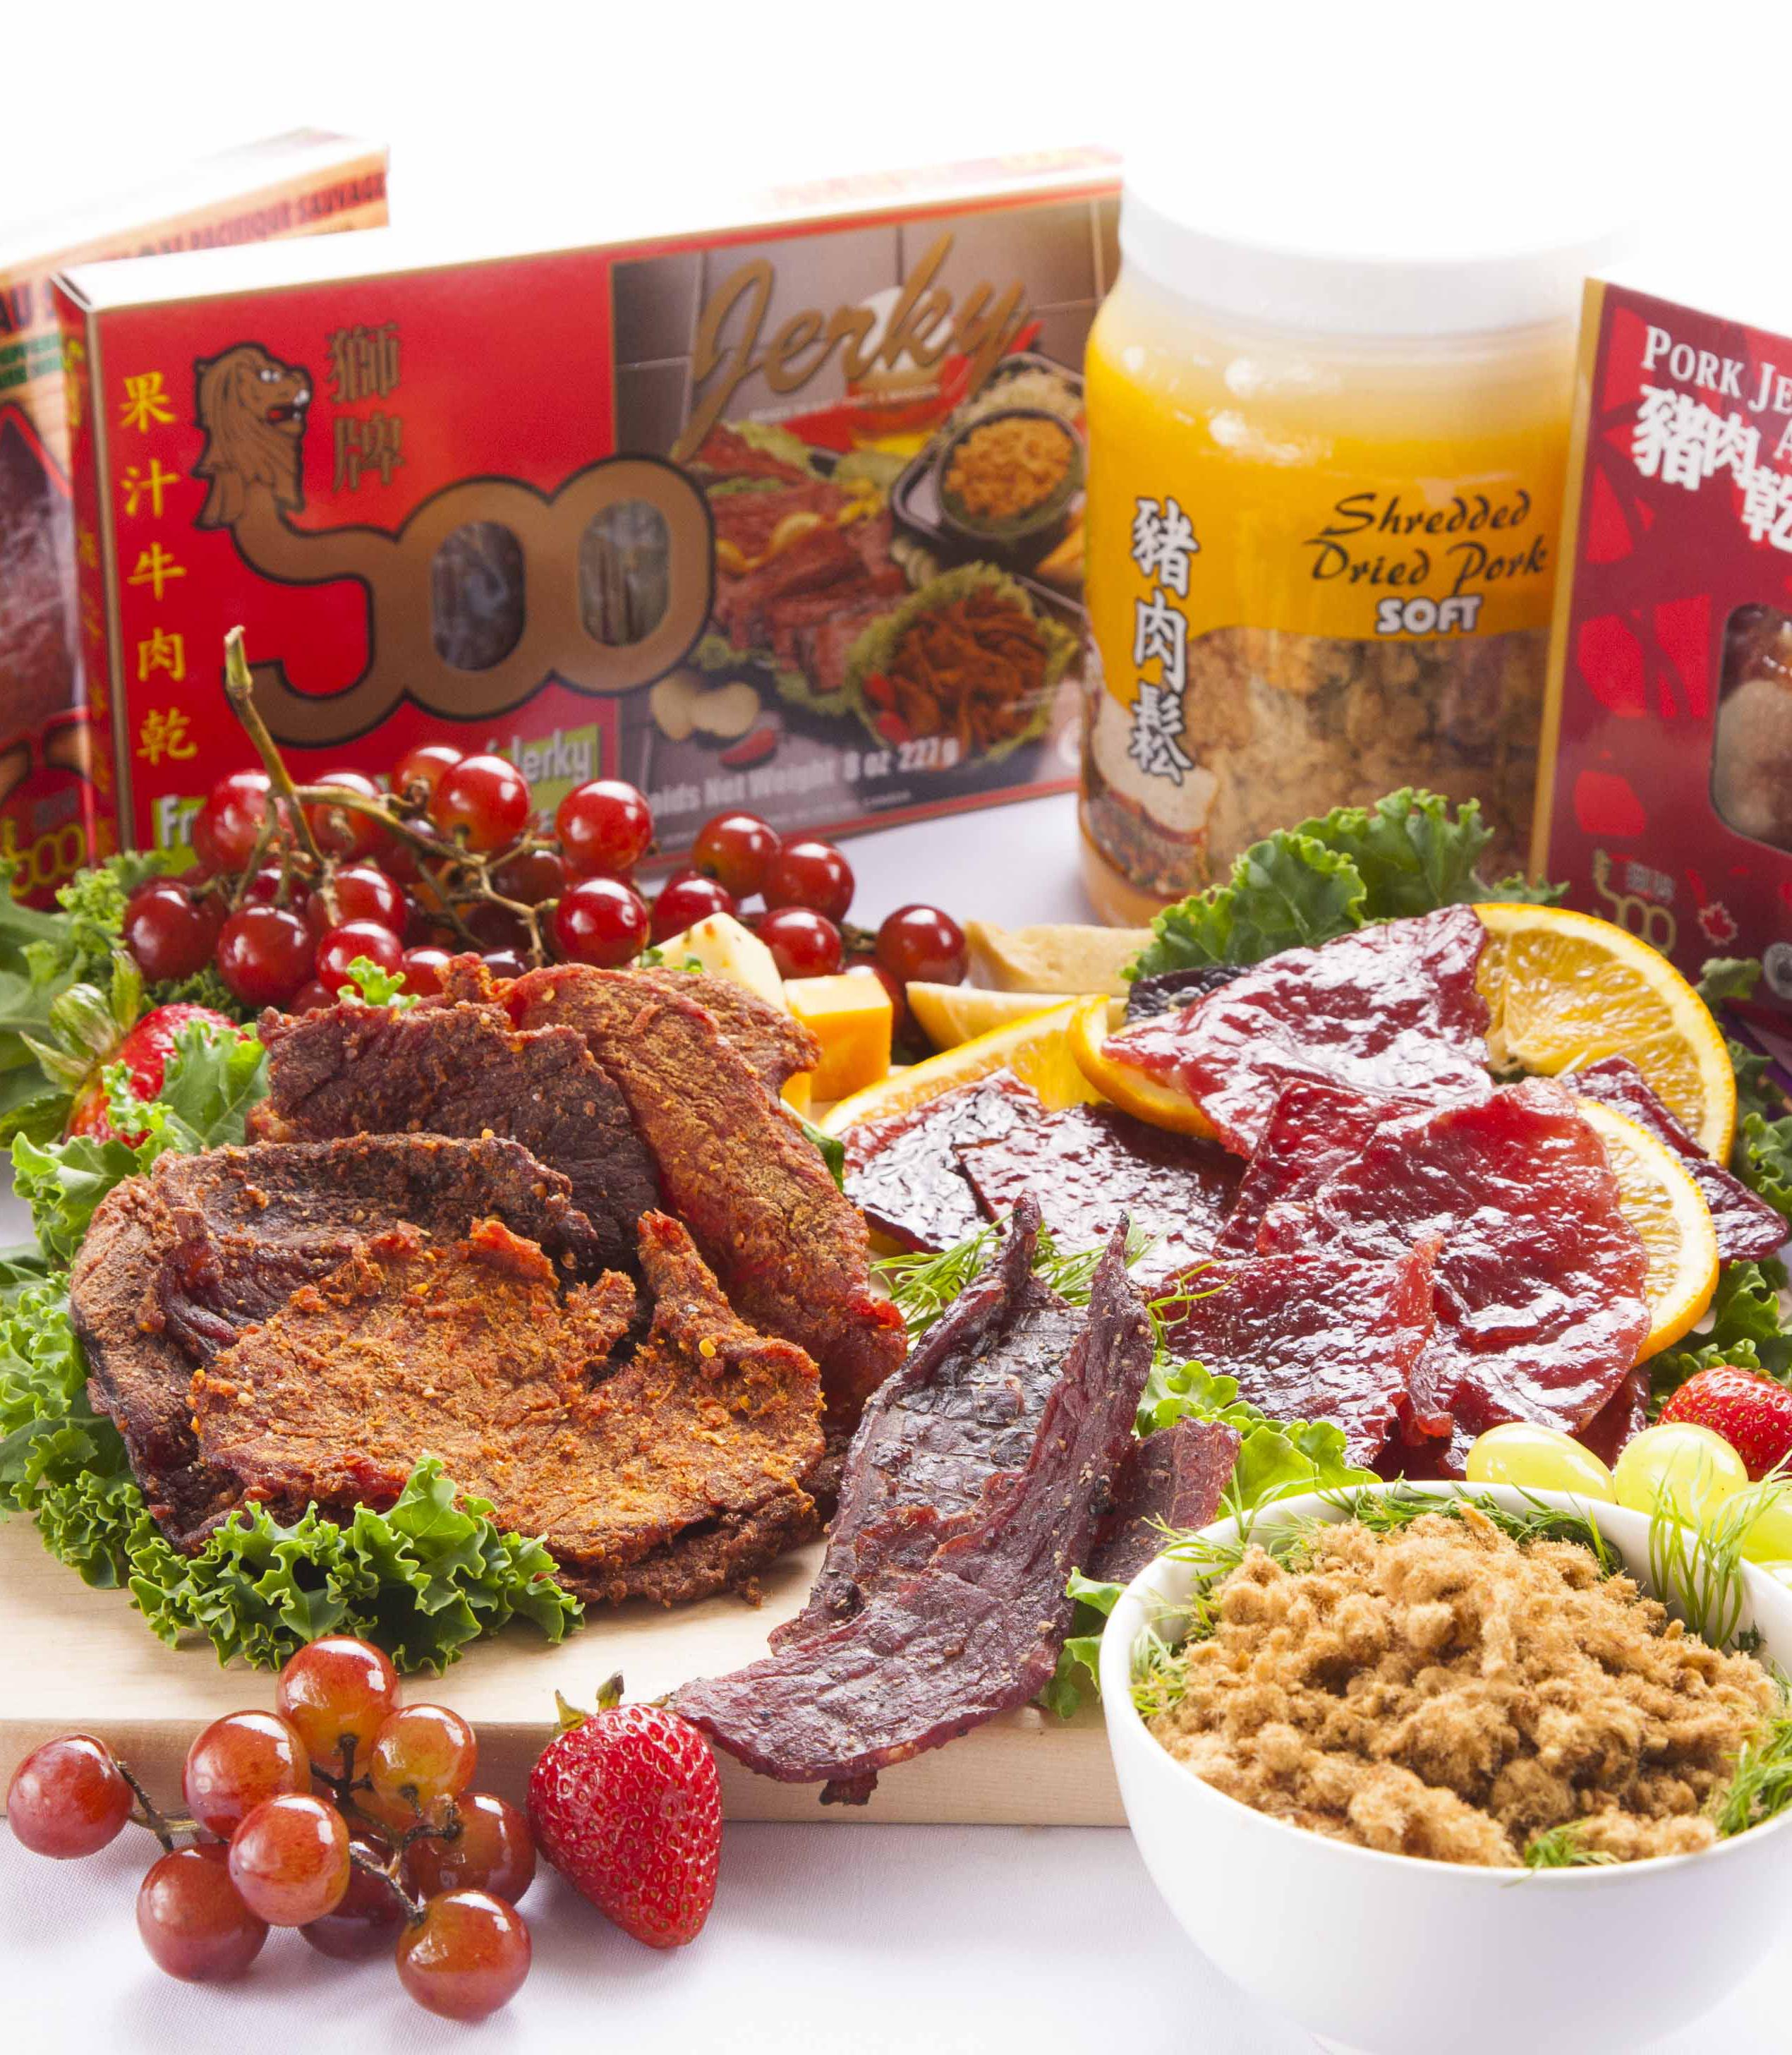 Soo Jerky - food photography